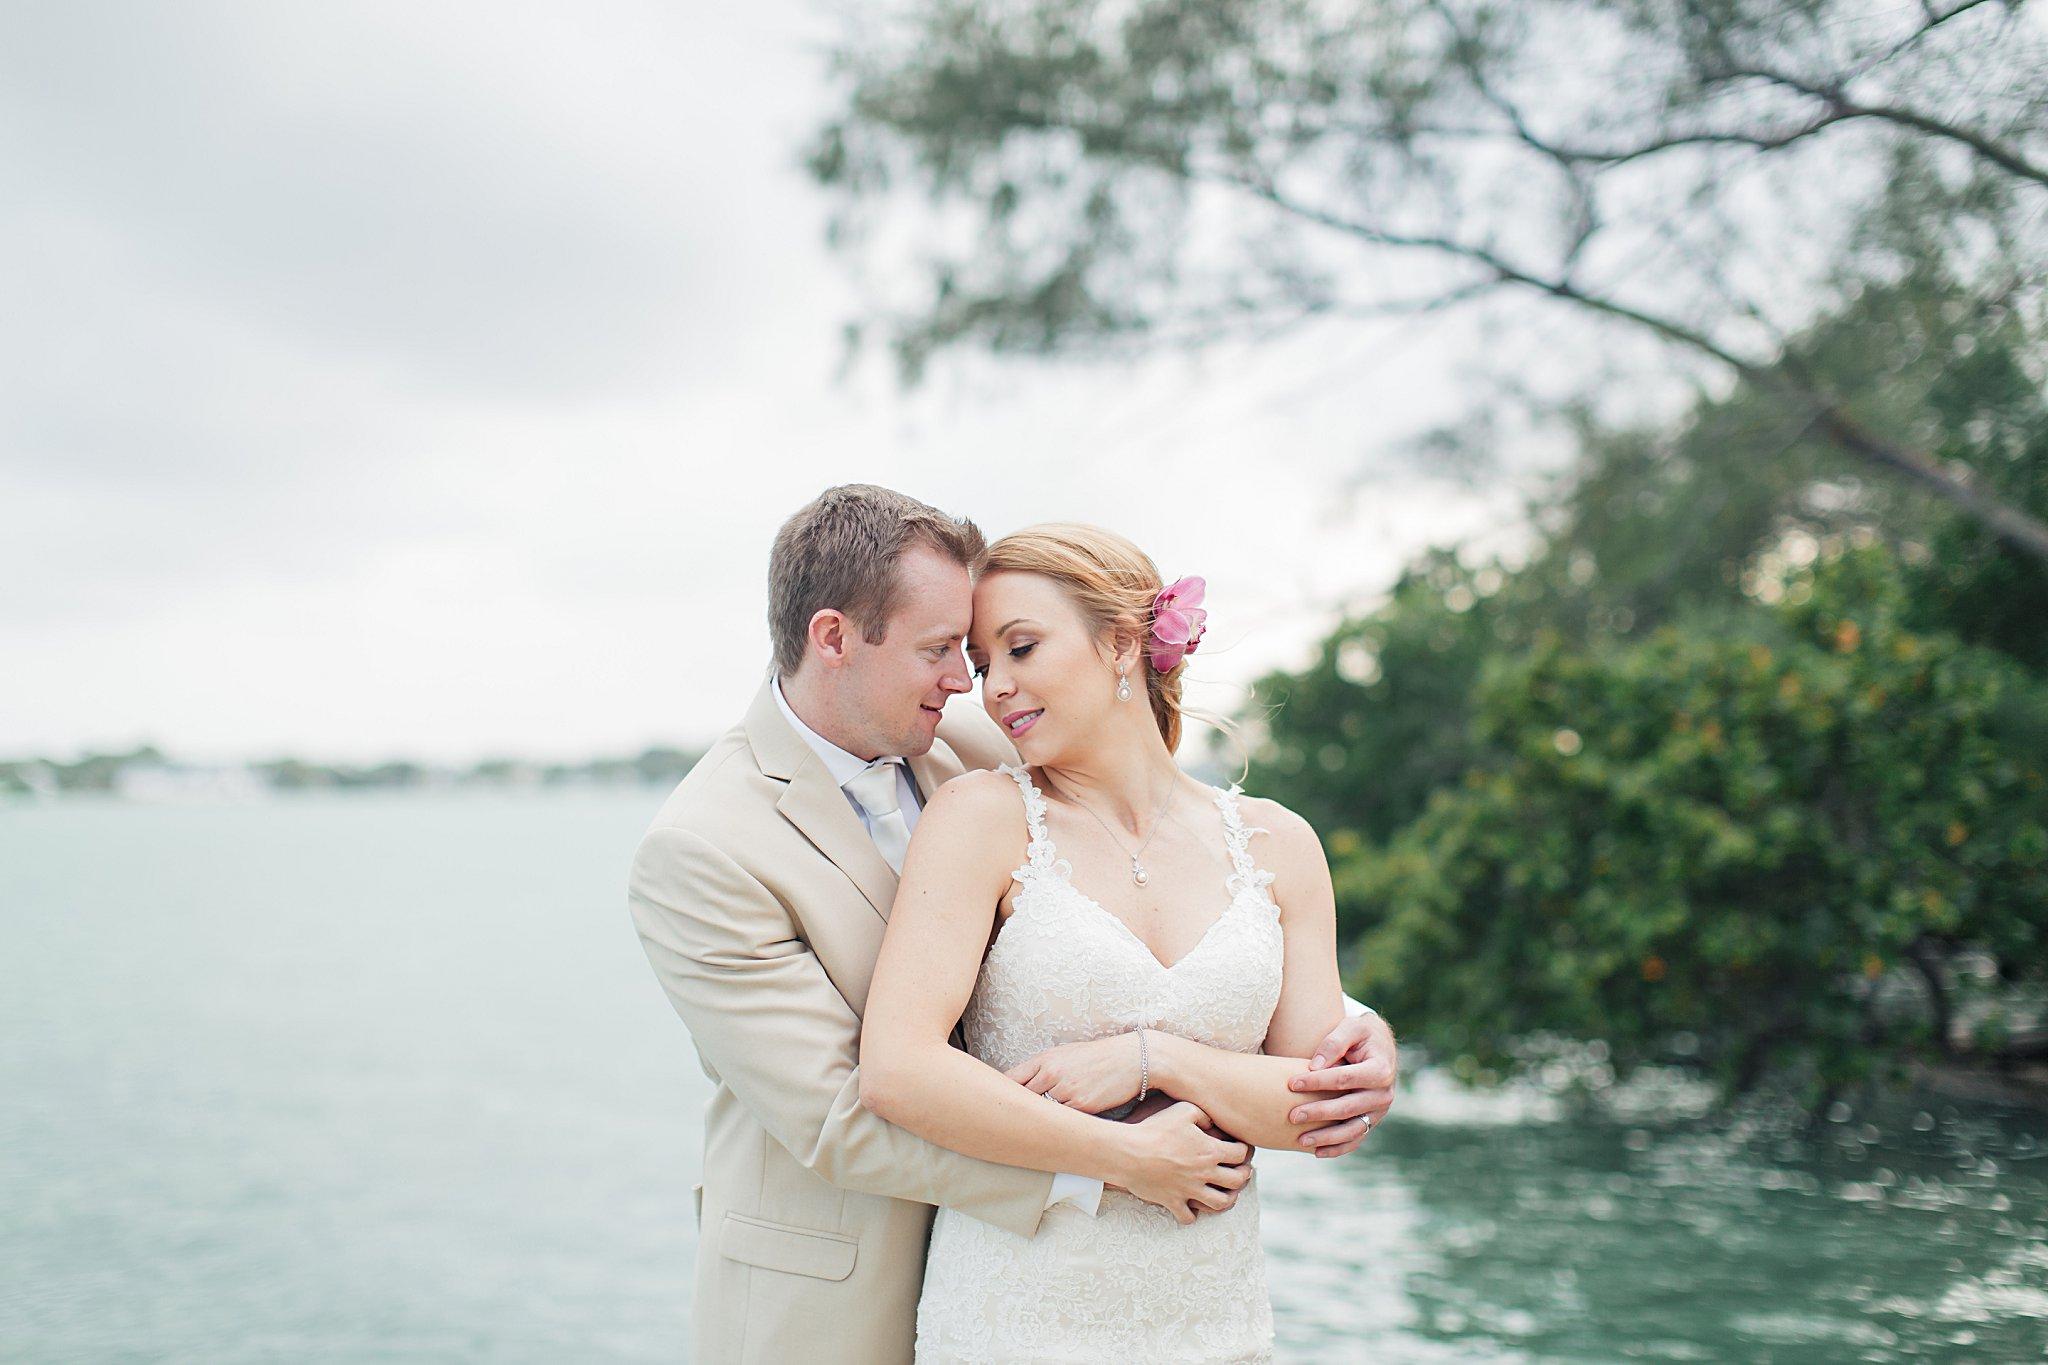 WeddingandEngagementFloridaPhotographer_2076.jpg